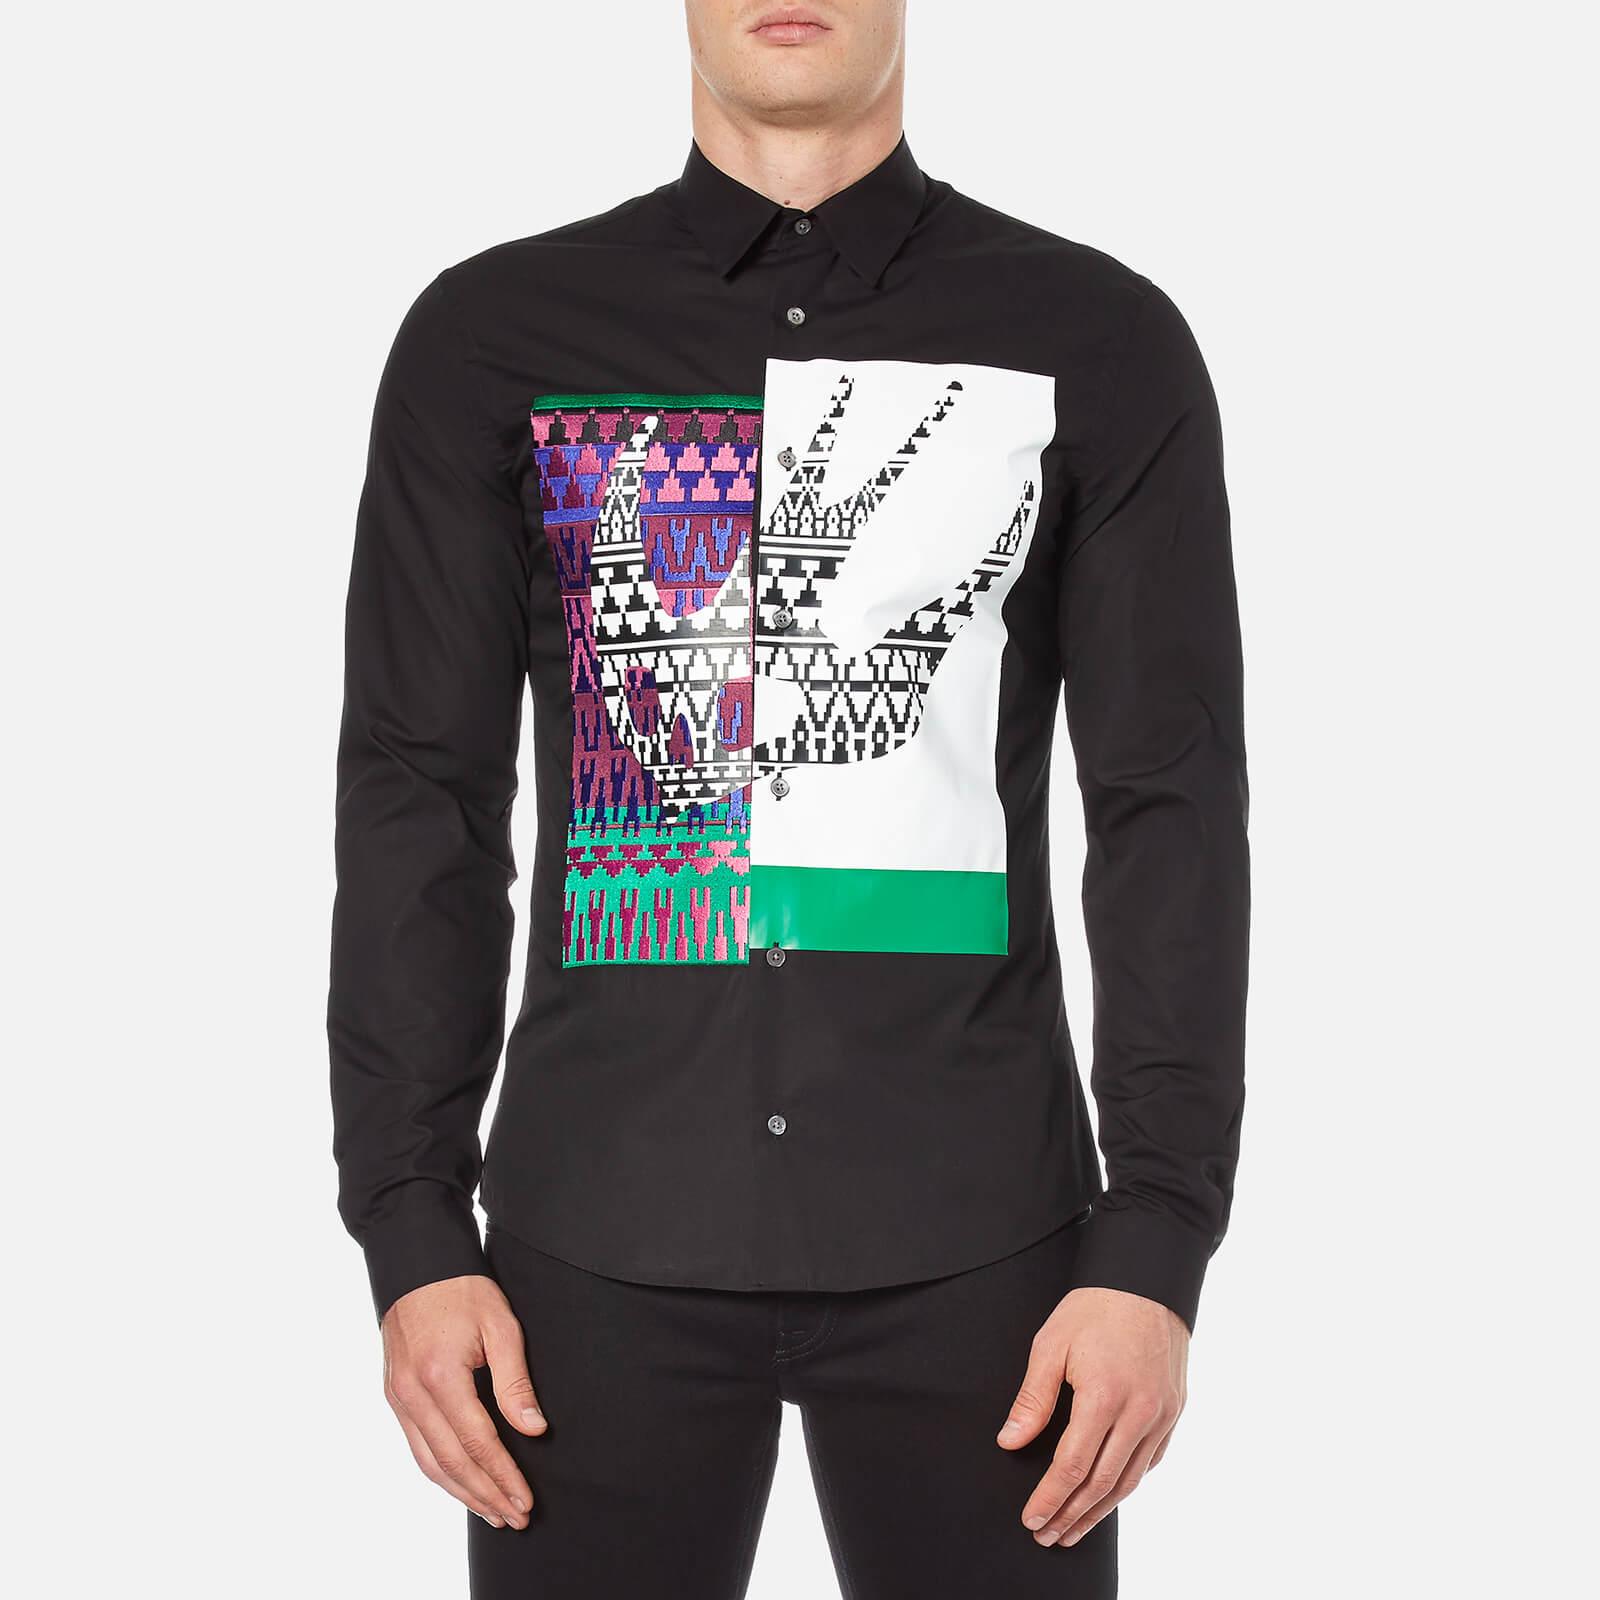 d57ea680503 McQ Alexander McQueen Men s Abstract Swallow Print Googe Shirt - Darkest  Black - Free UK Delivery over £50